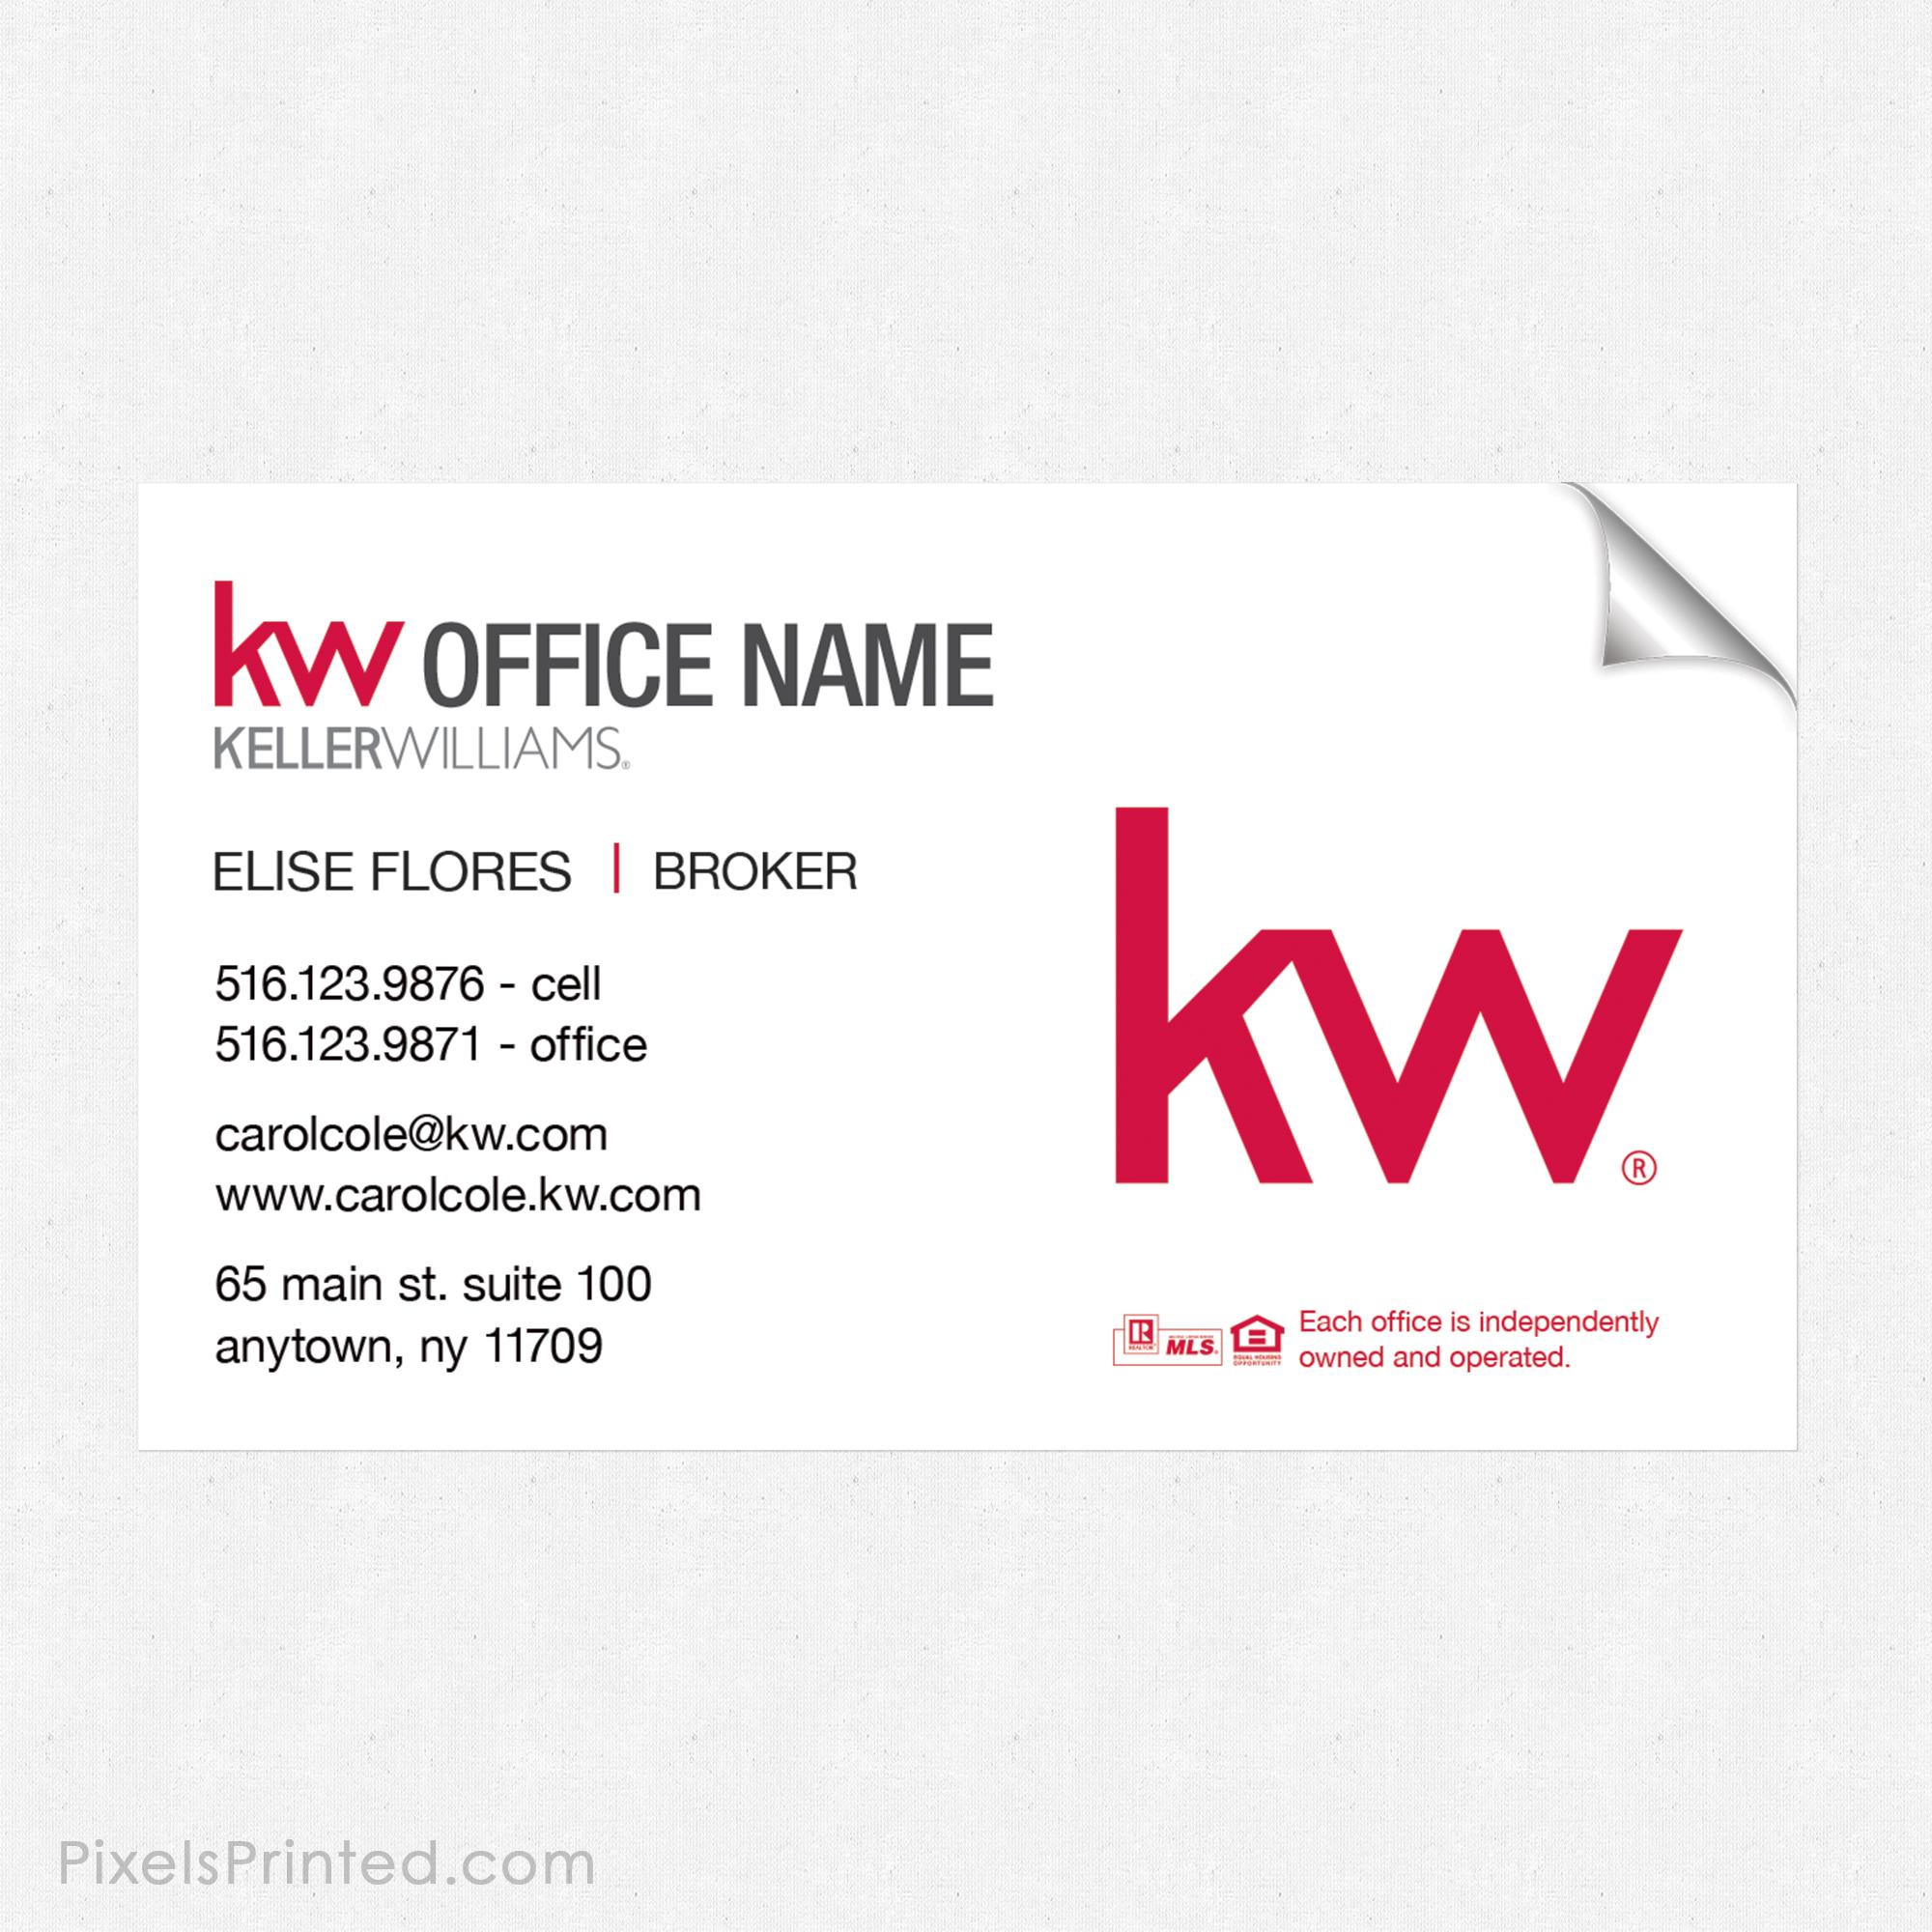 Kw Business Card Sticker Keller Williams Business Cards Magnetic Business Cards Real Estate Business Cards